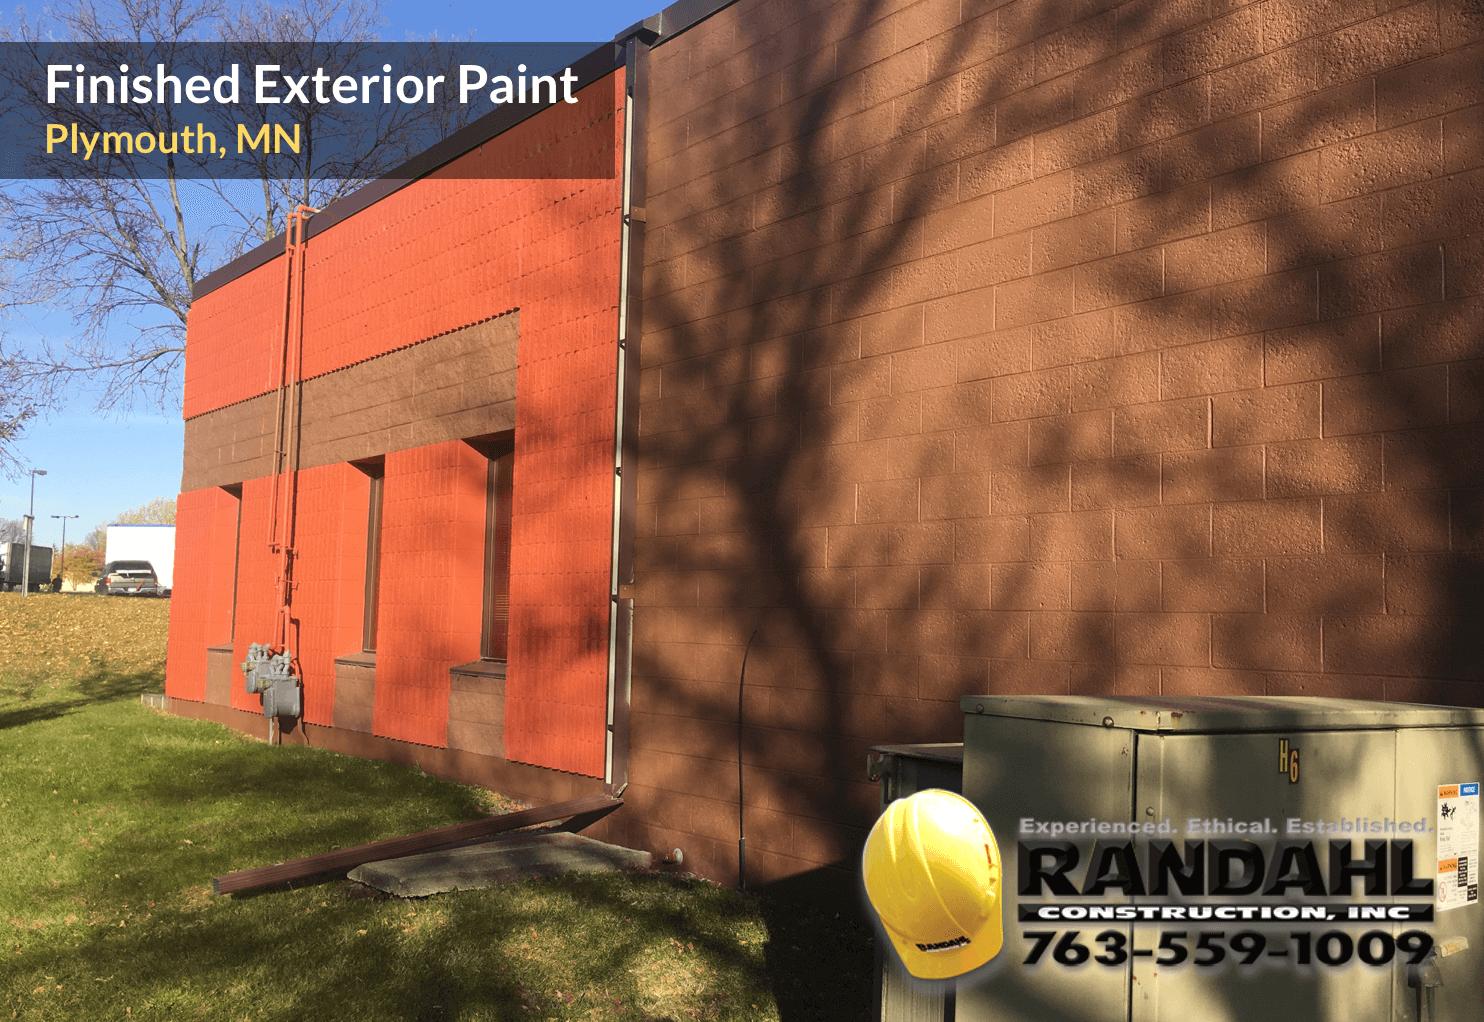 minnesota painting contractor